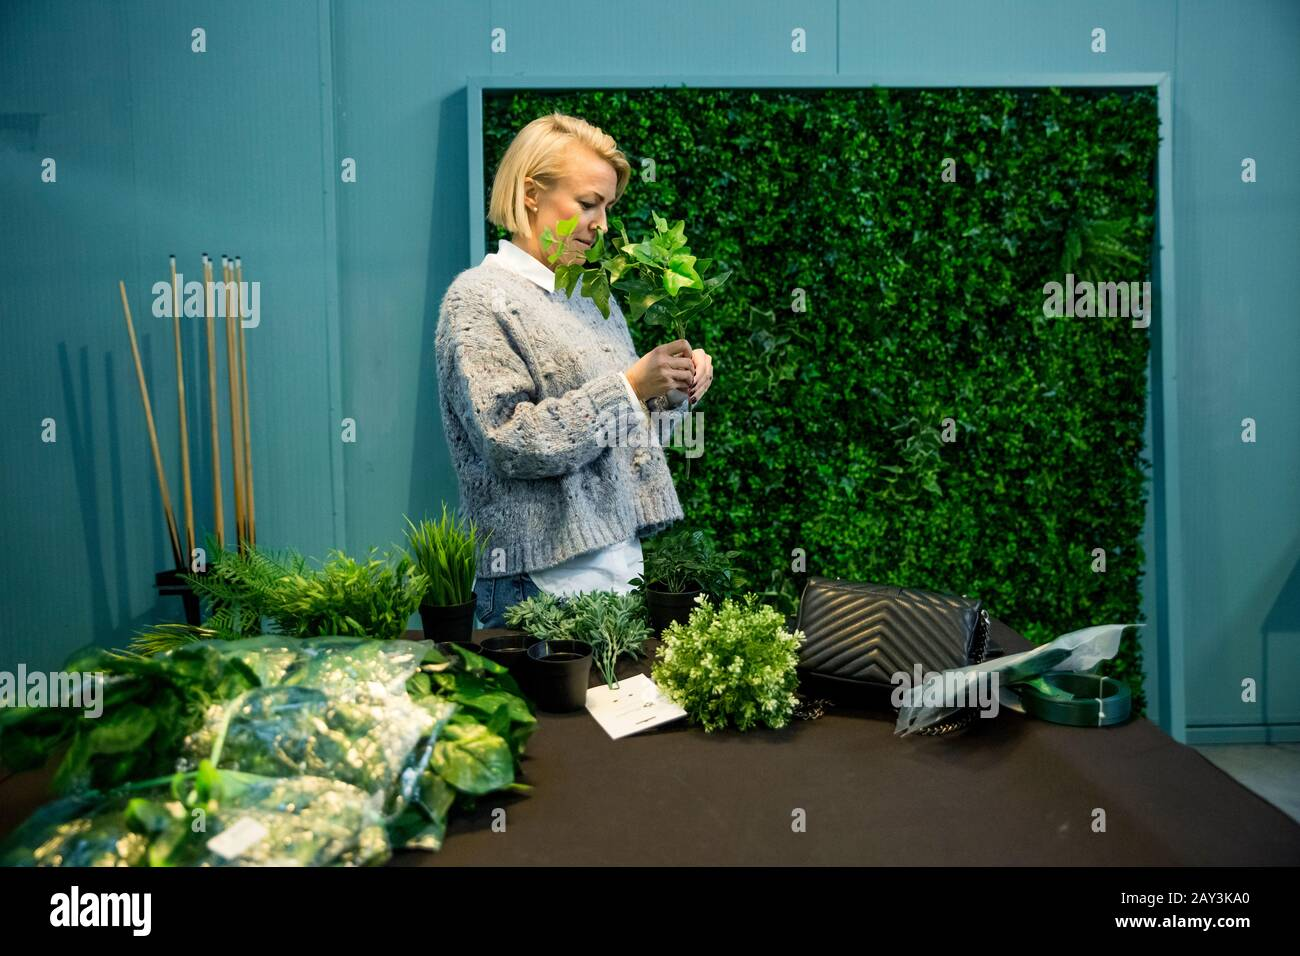 Woman arranging plants Stock Photo